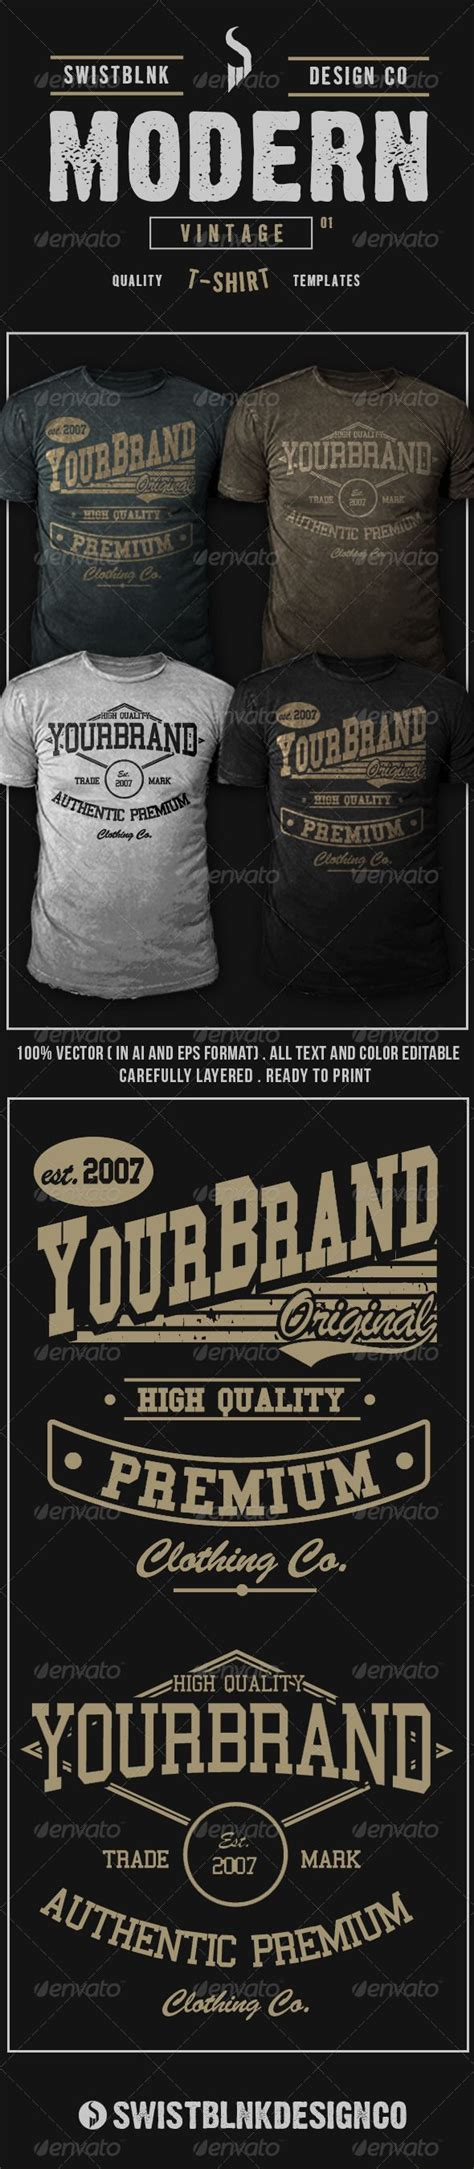 Kaos Tshirt Distro Ordinal Shinchan 01 best 25 design kaos ideas on design shirts t shirt designs and